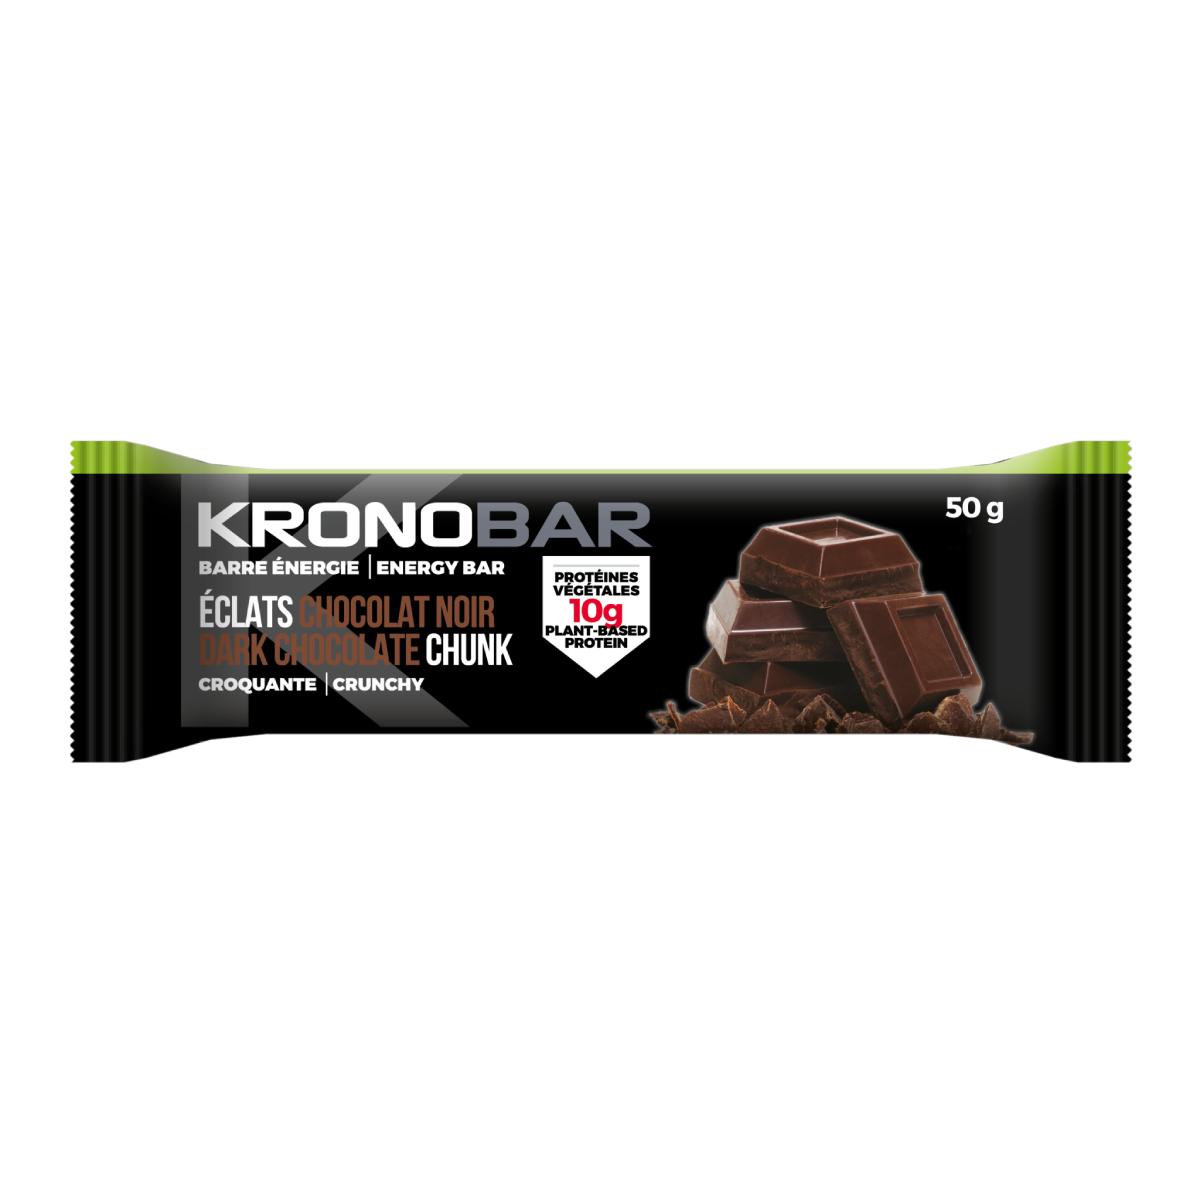 barre-energetique-proteinee-kronobar-eclat-chocolat-noir